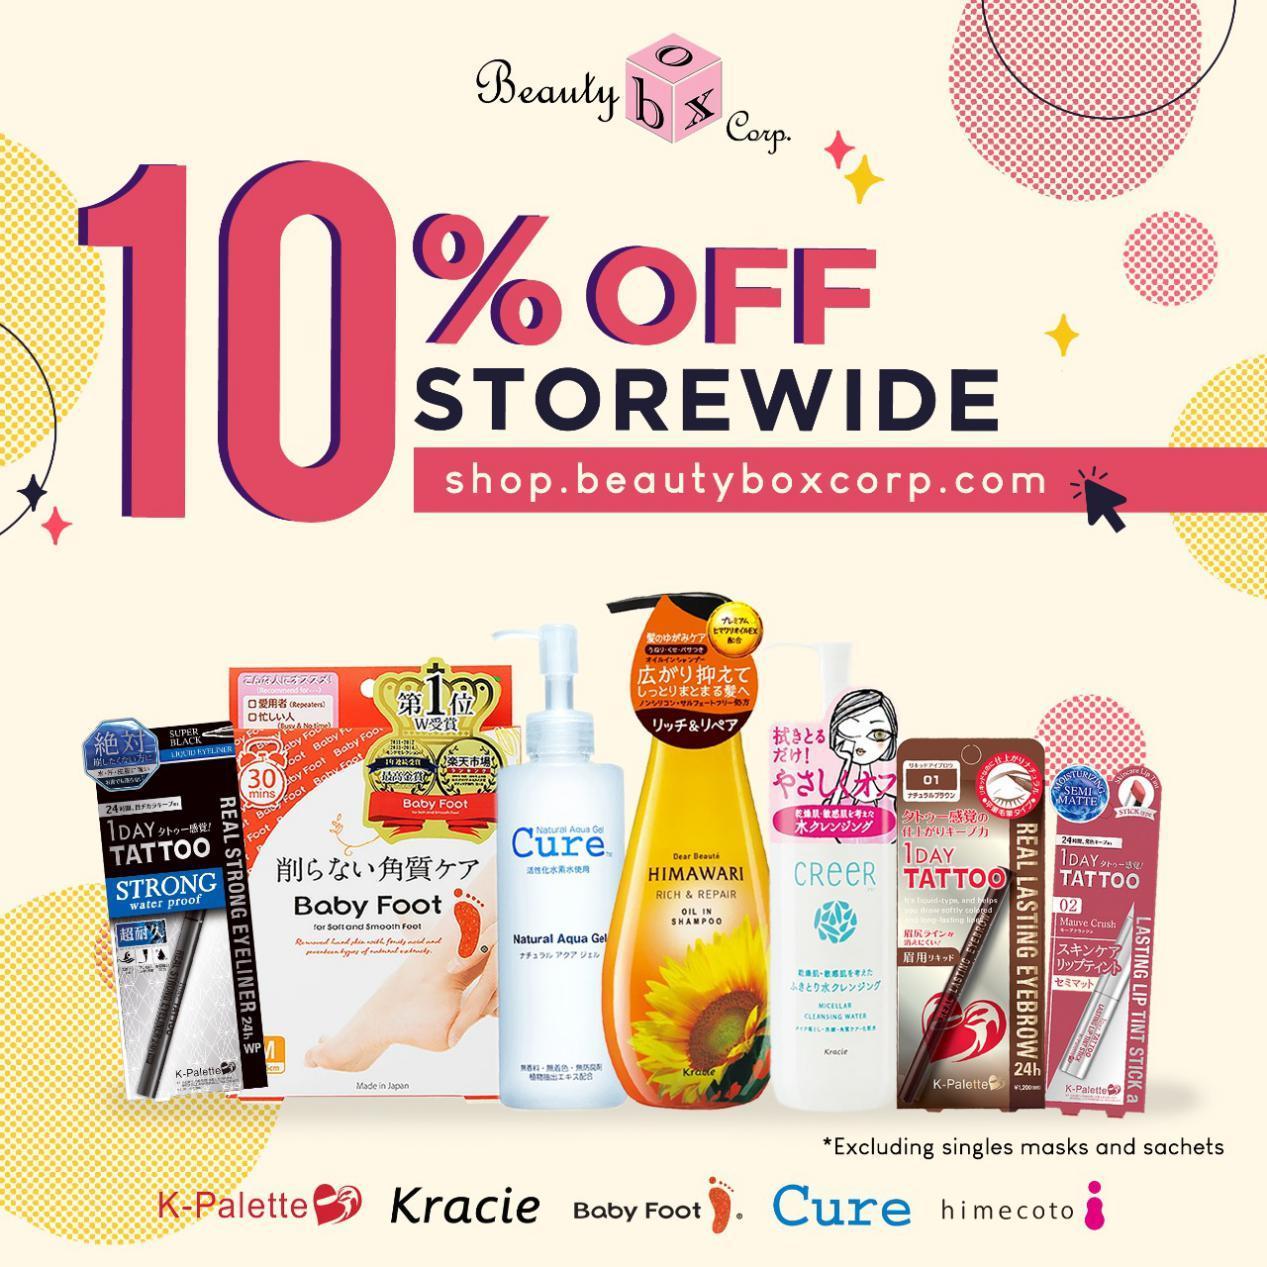 10% storewide - Angelica Tuazon